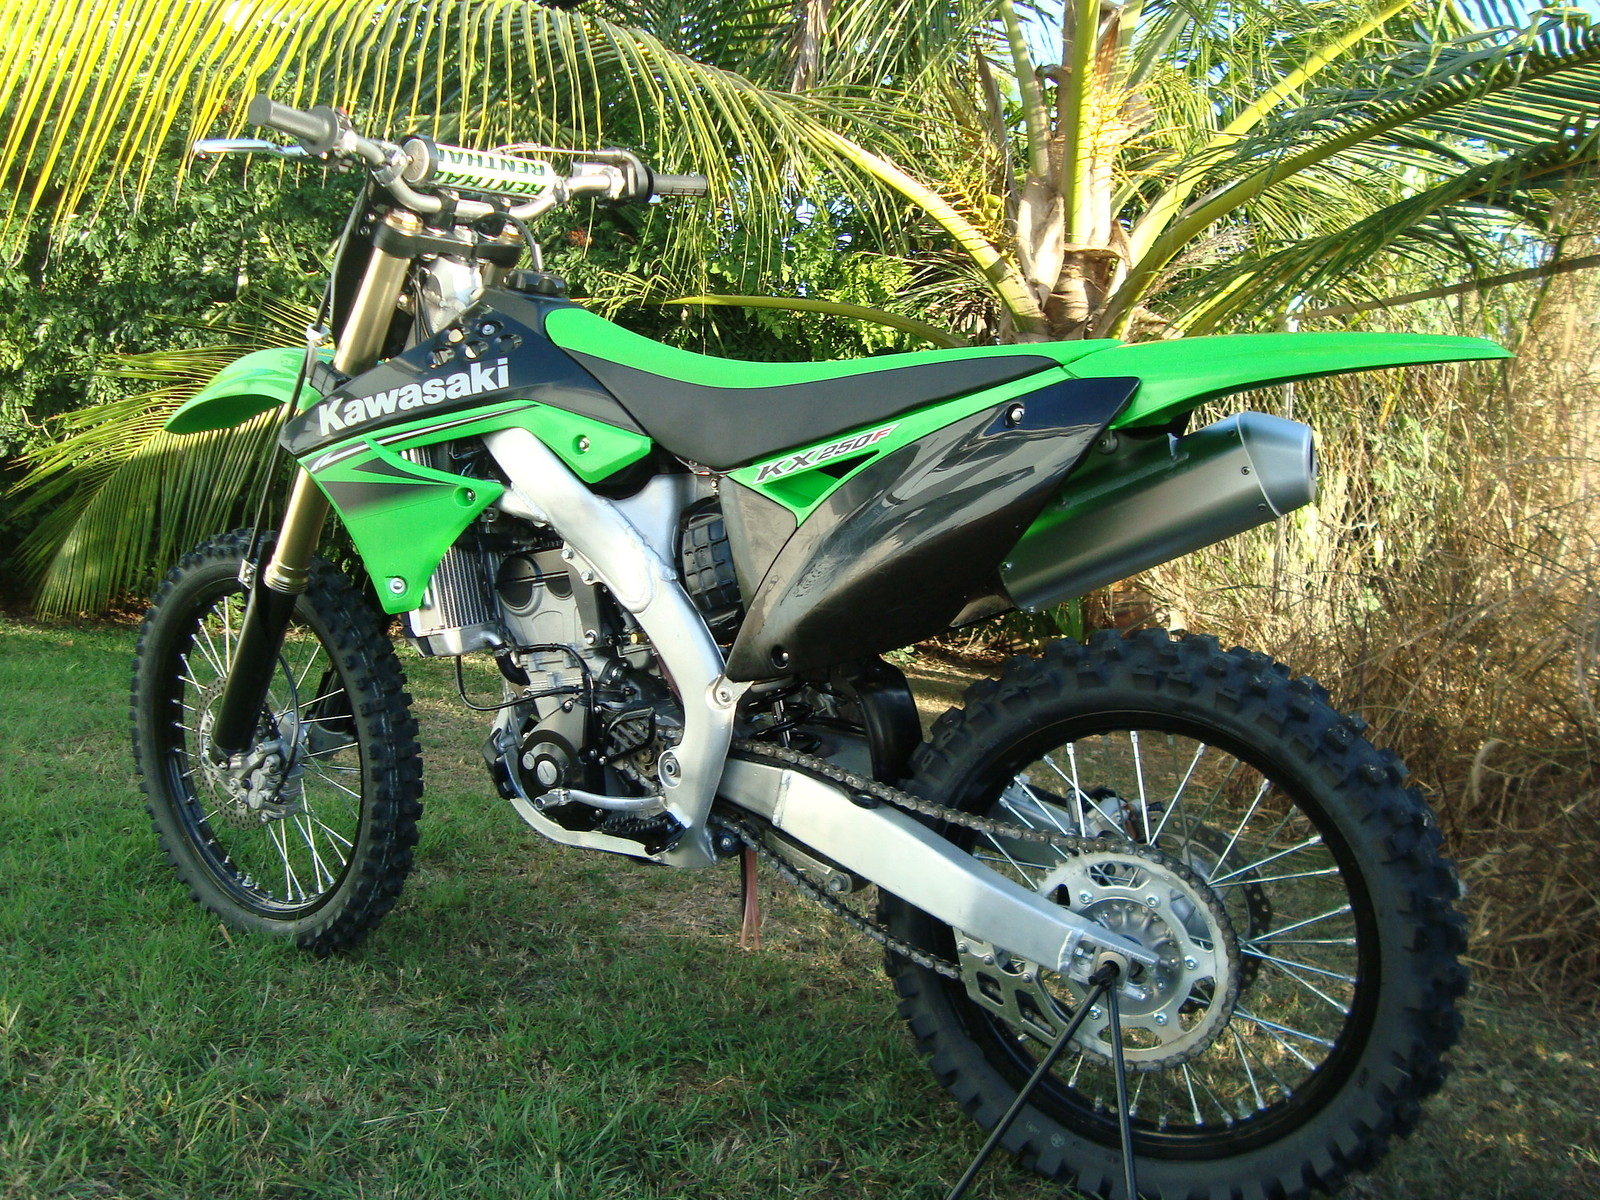 2010 KX250F